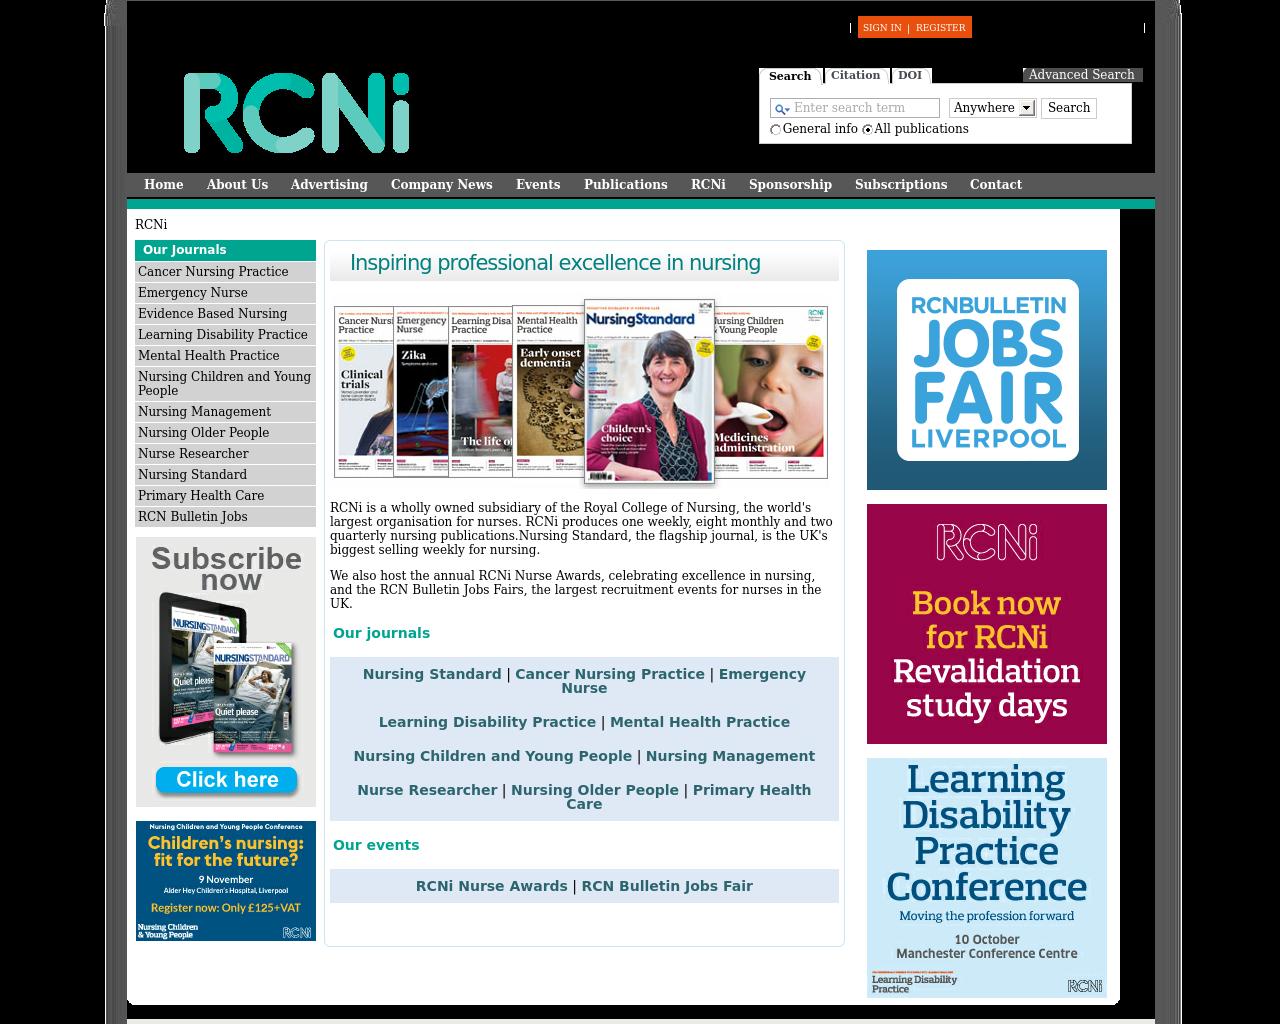 RCN-Publishing-Advertising-Reviews-Pricing